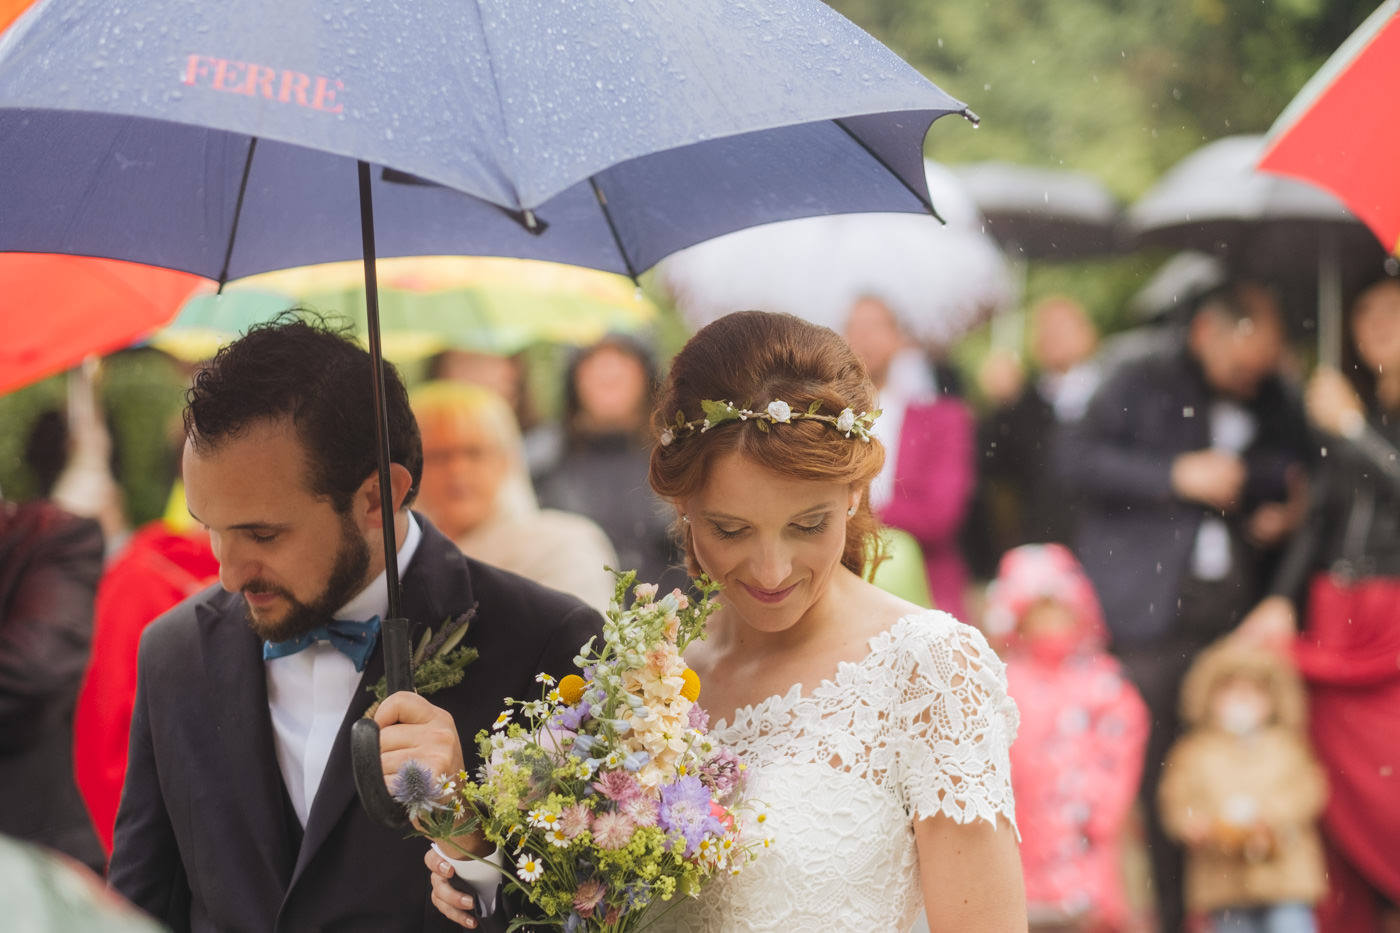 matrimoni_all_italiana_fotografo_matrimonio_toscana-29.jpg